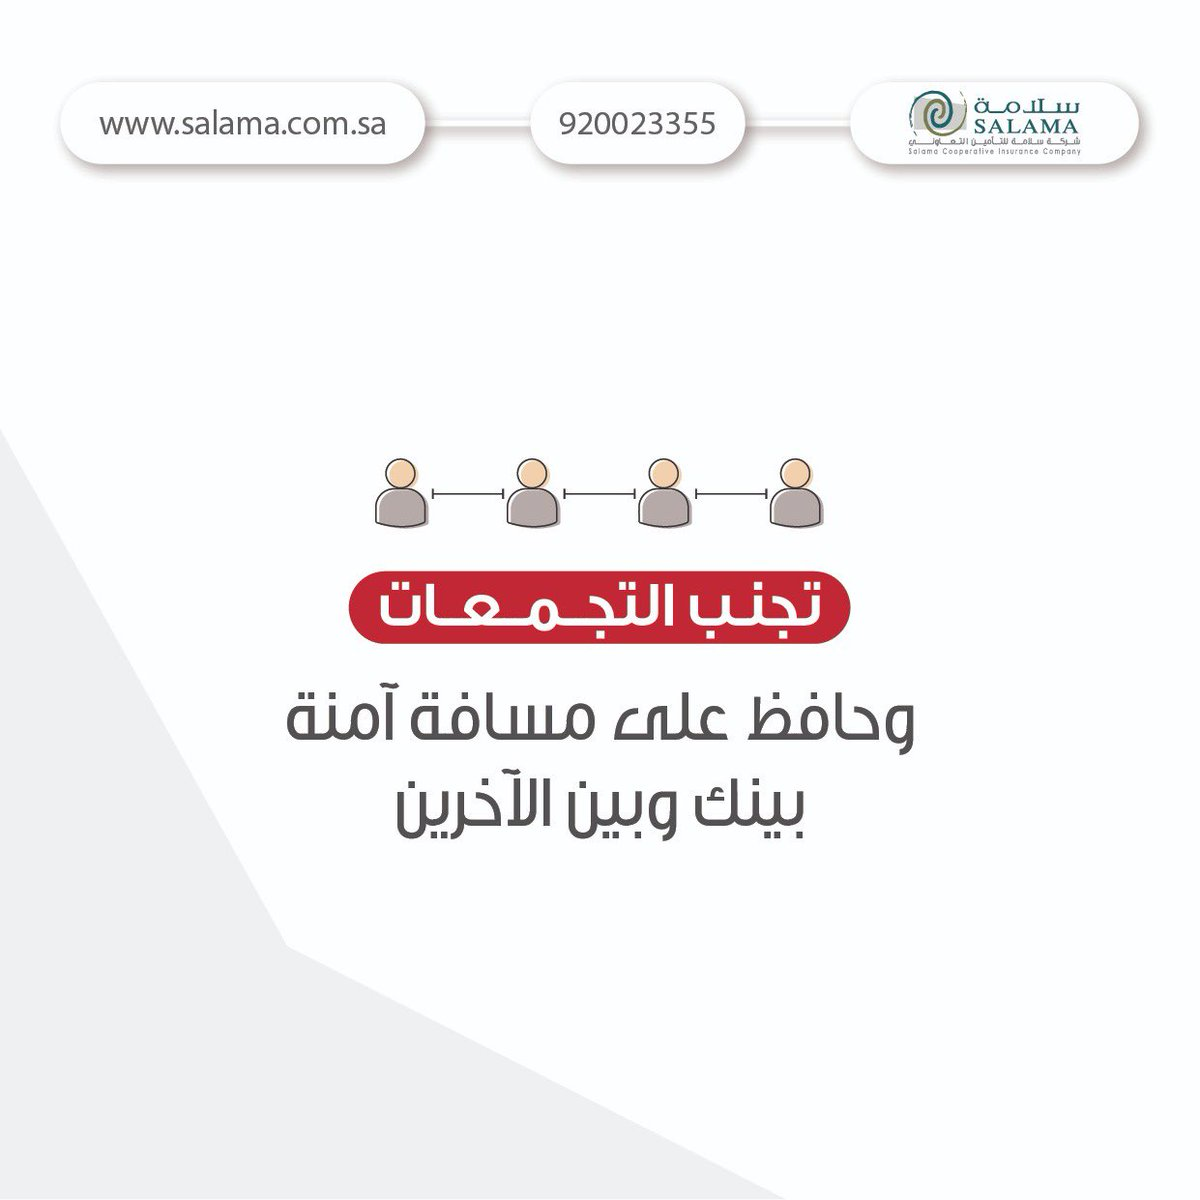 سلامة للتأمين Salamacic Twitter